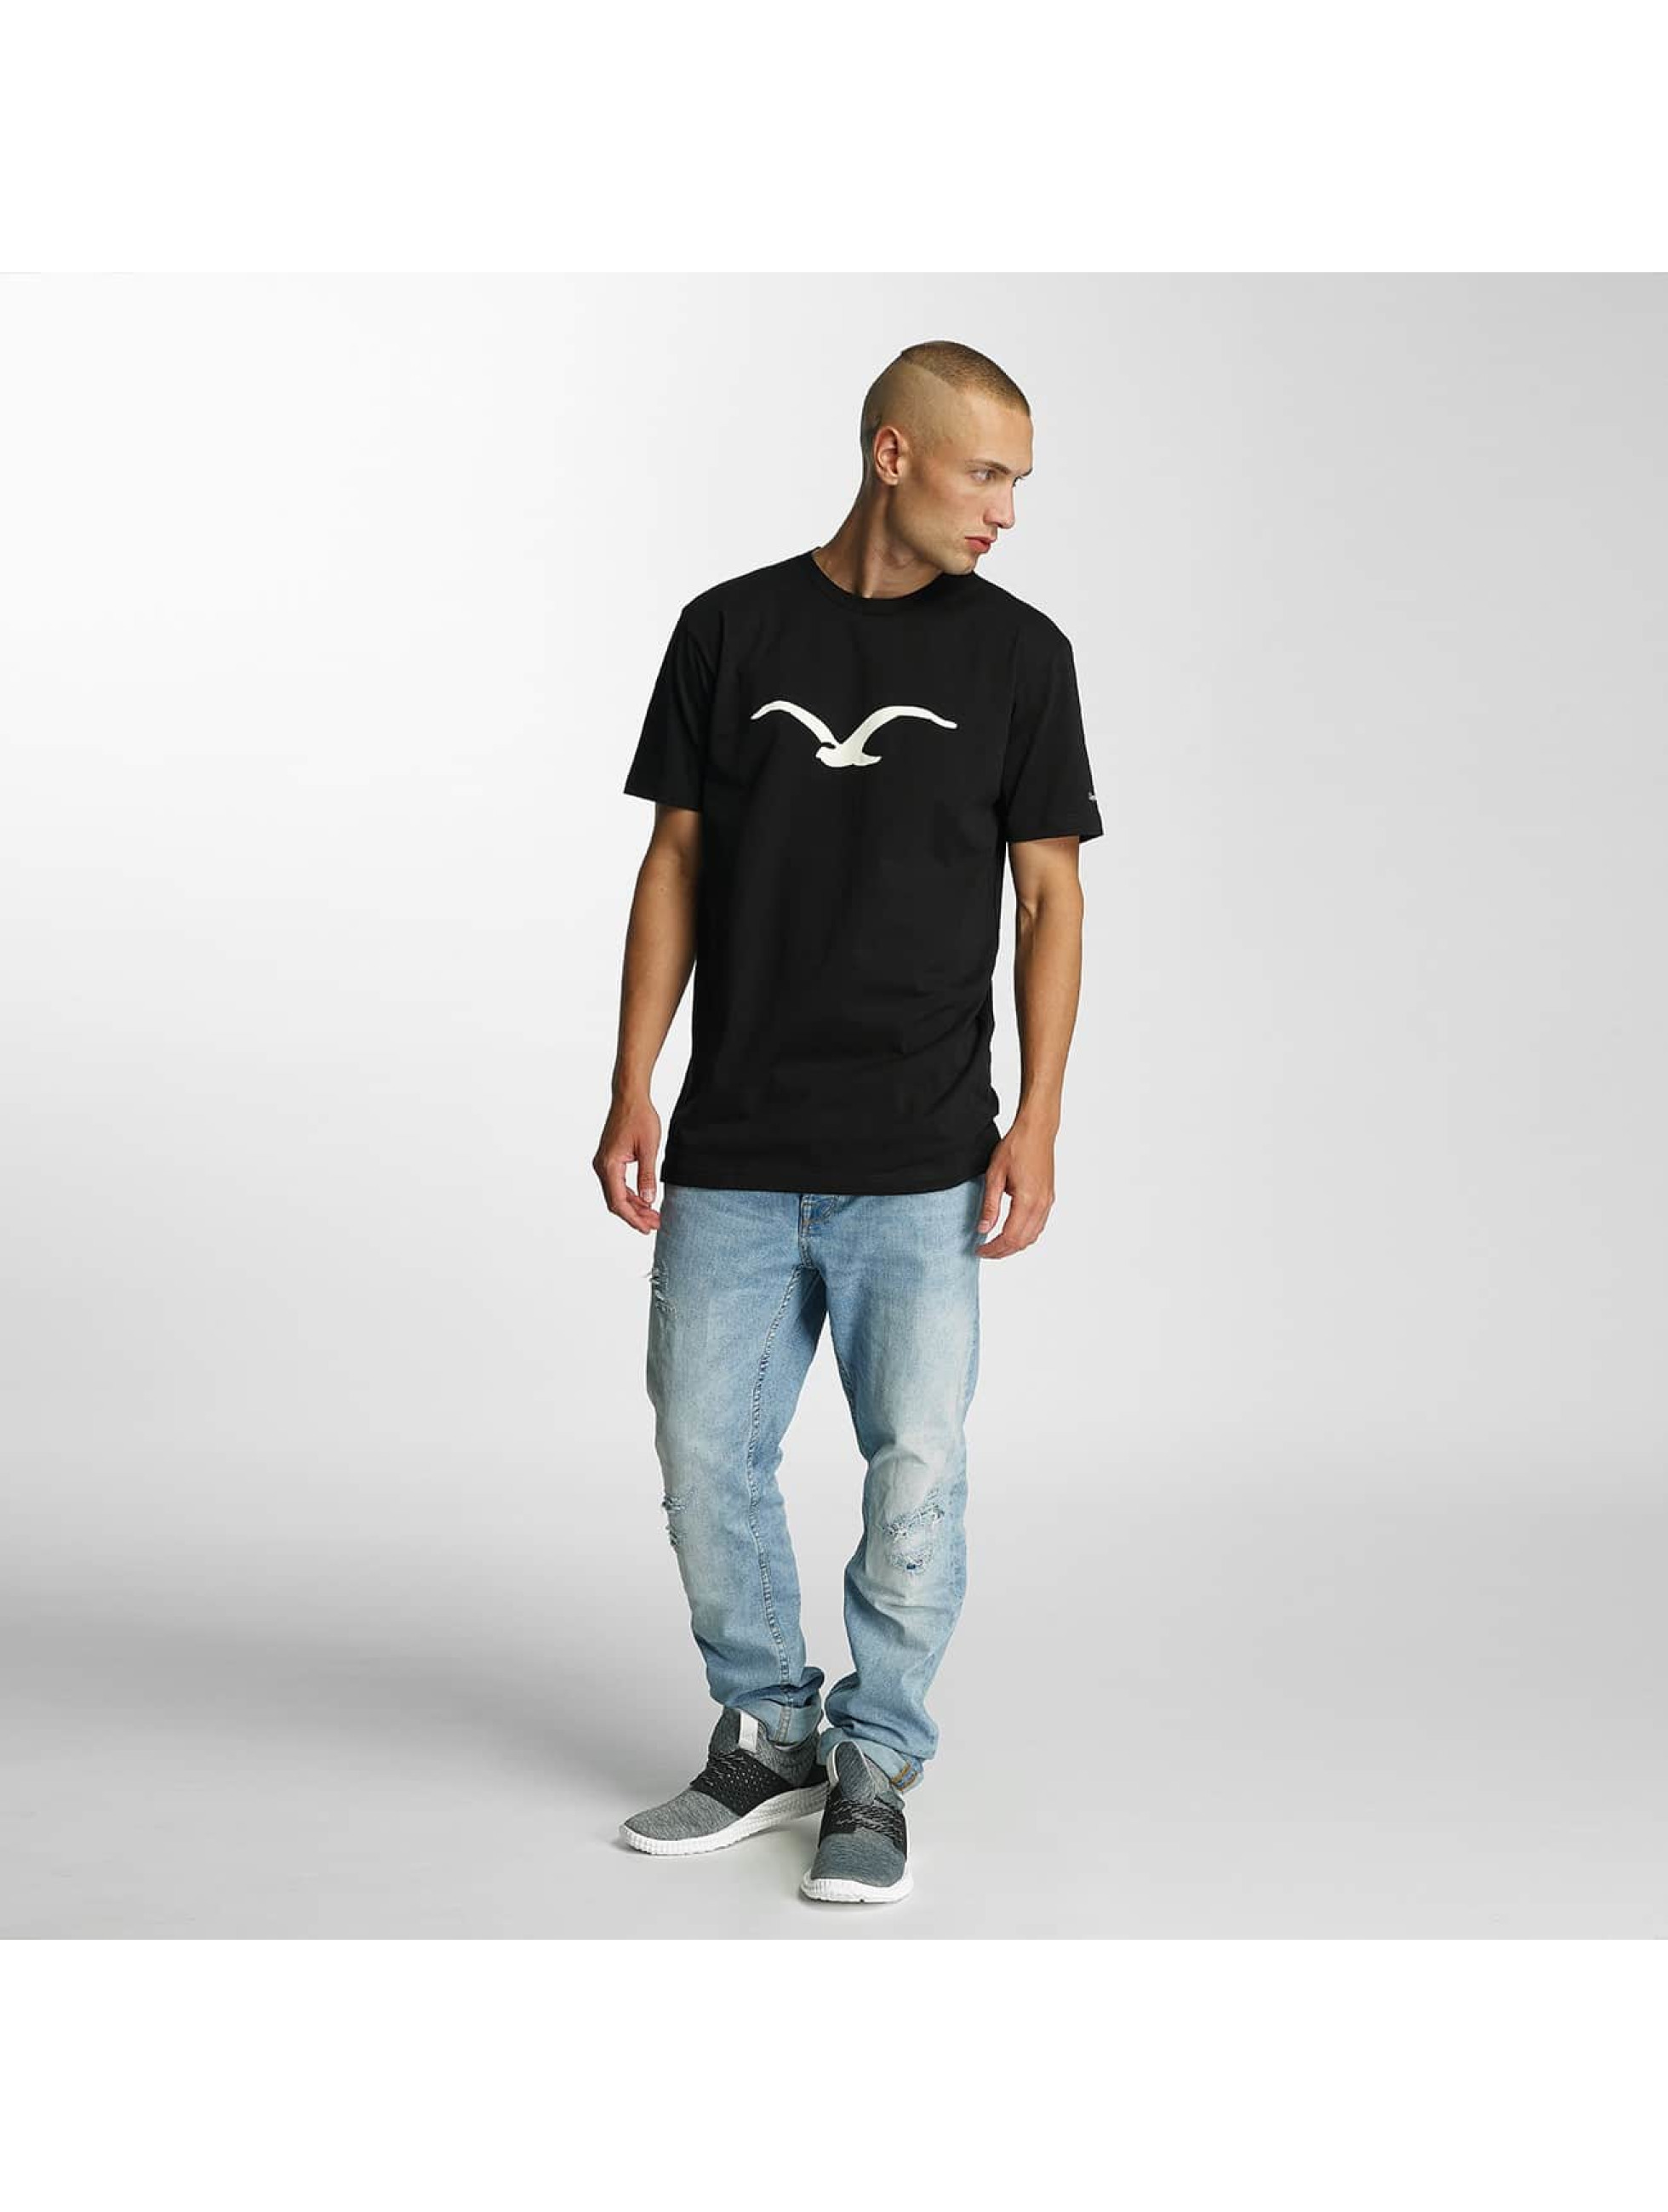 Cleptomanicx T-Shirt Basic schwarz